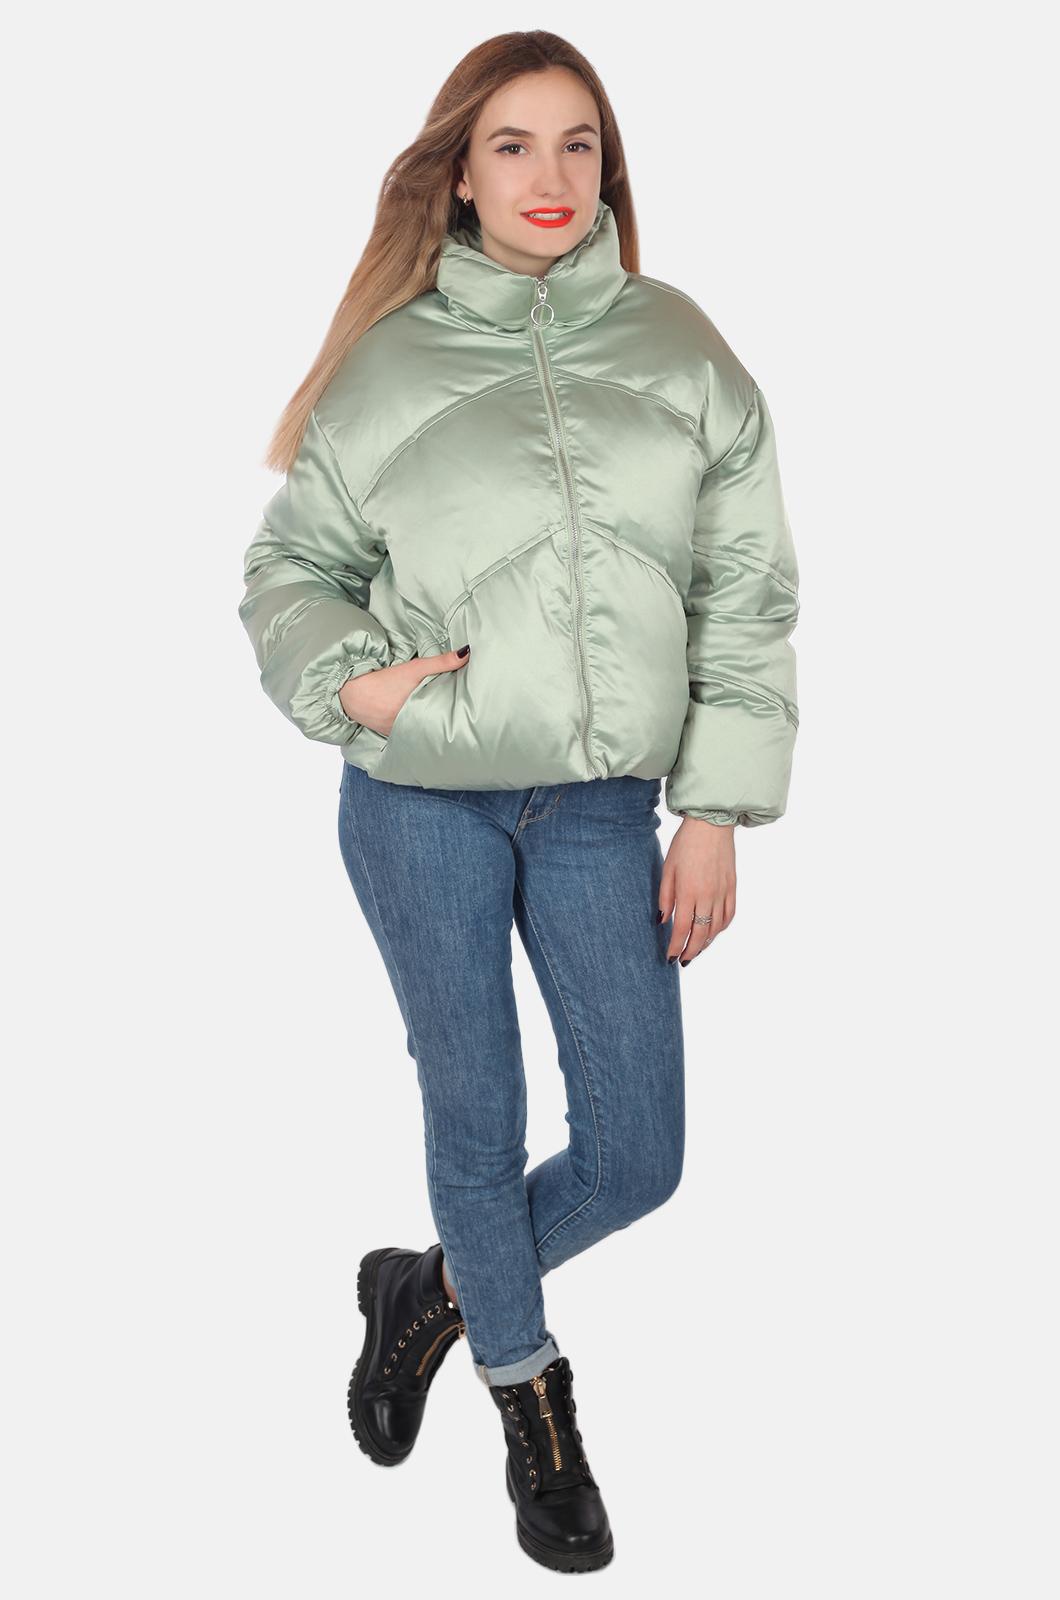 Курточка в стиле бомбер! ХИТ!